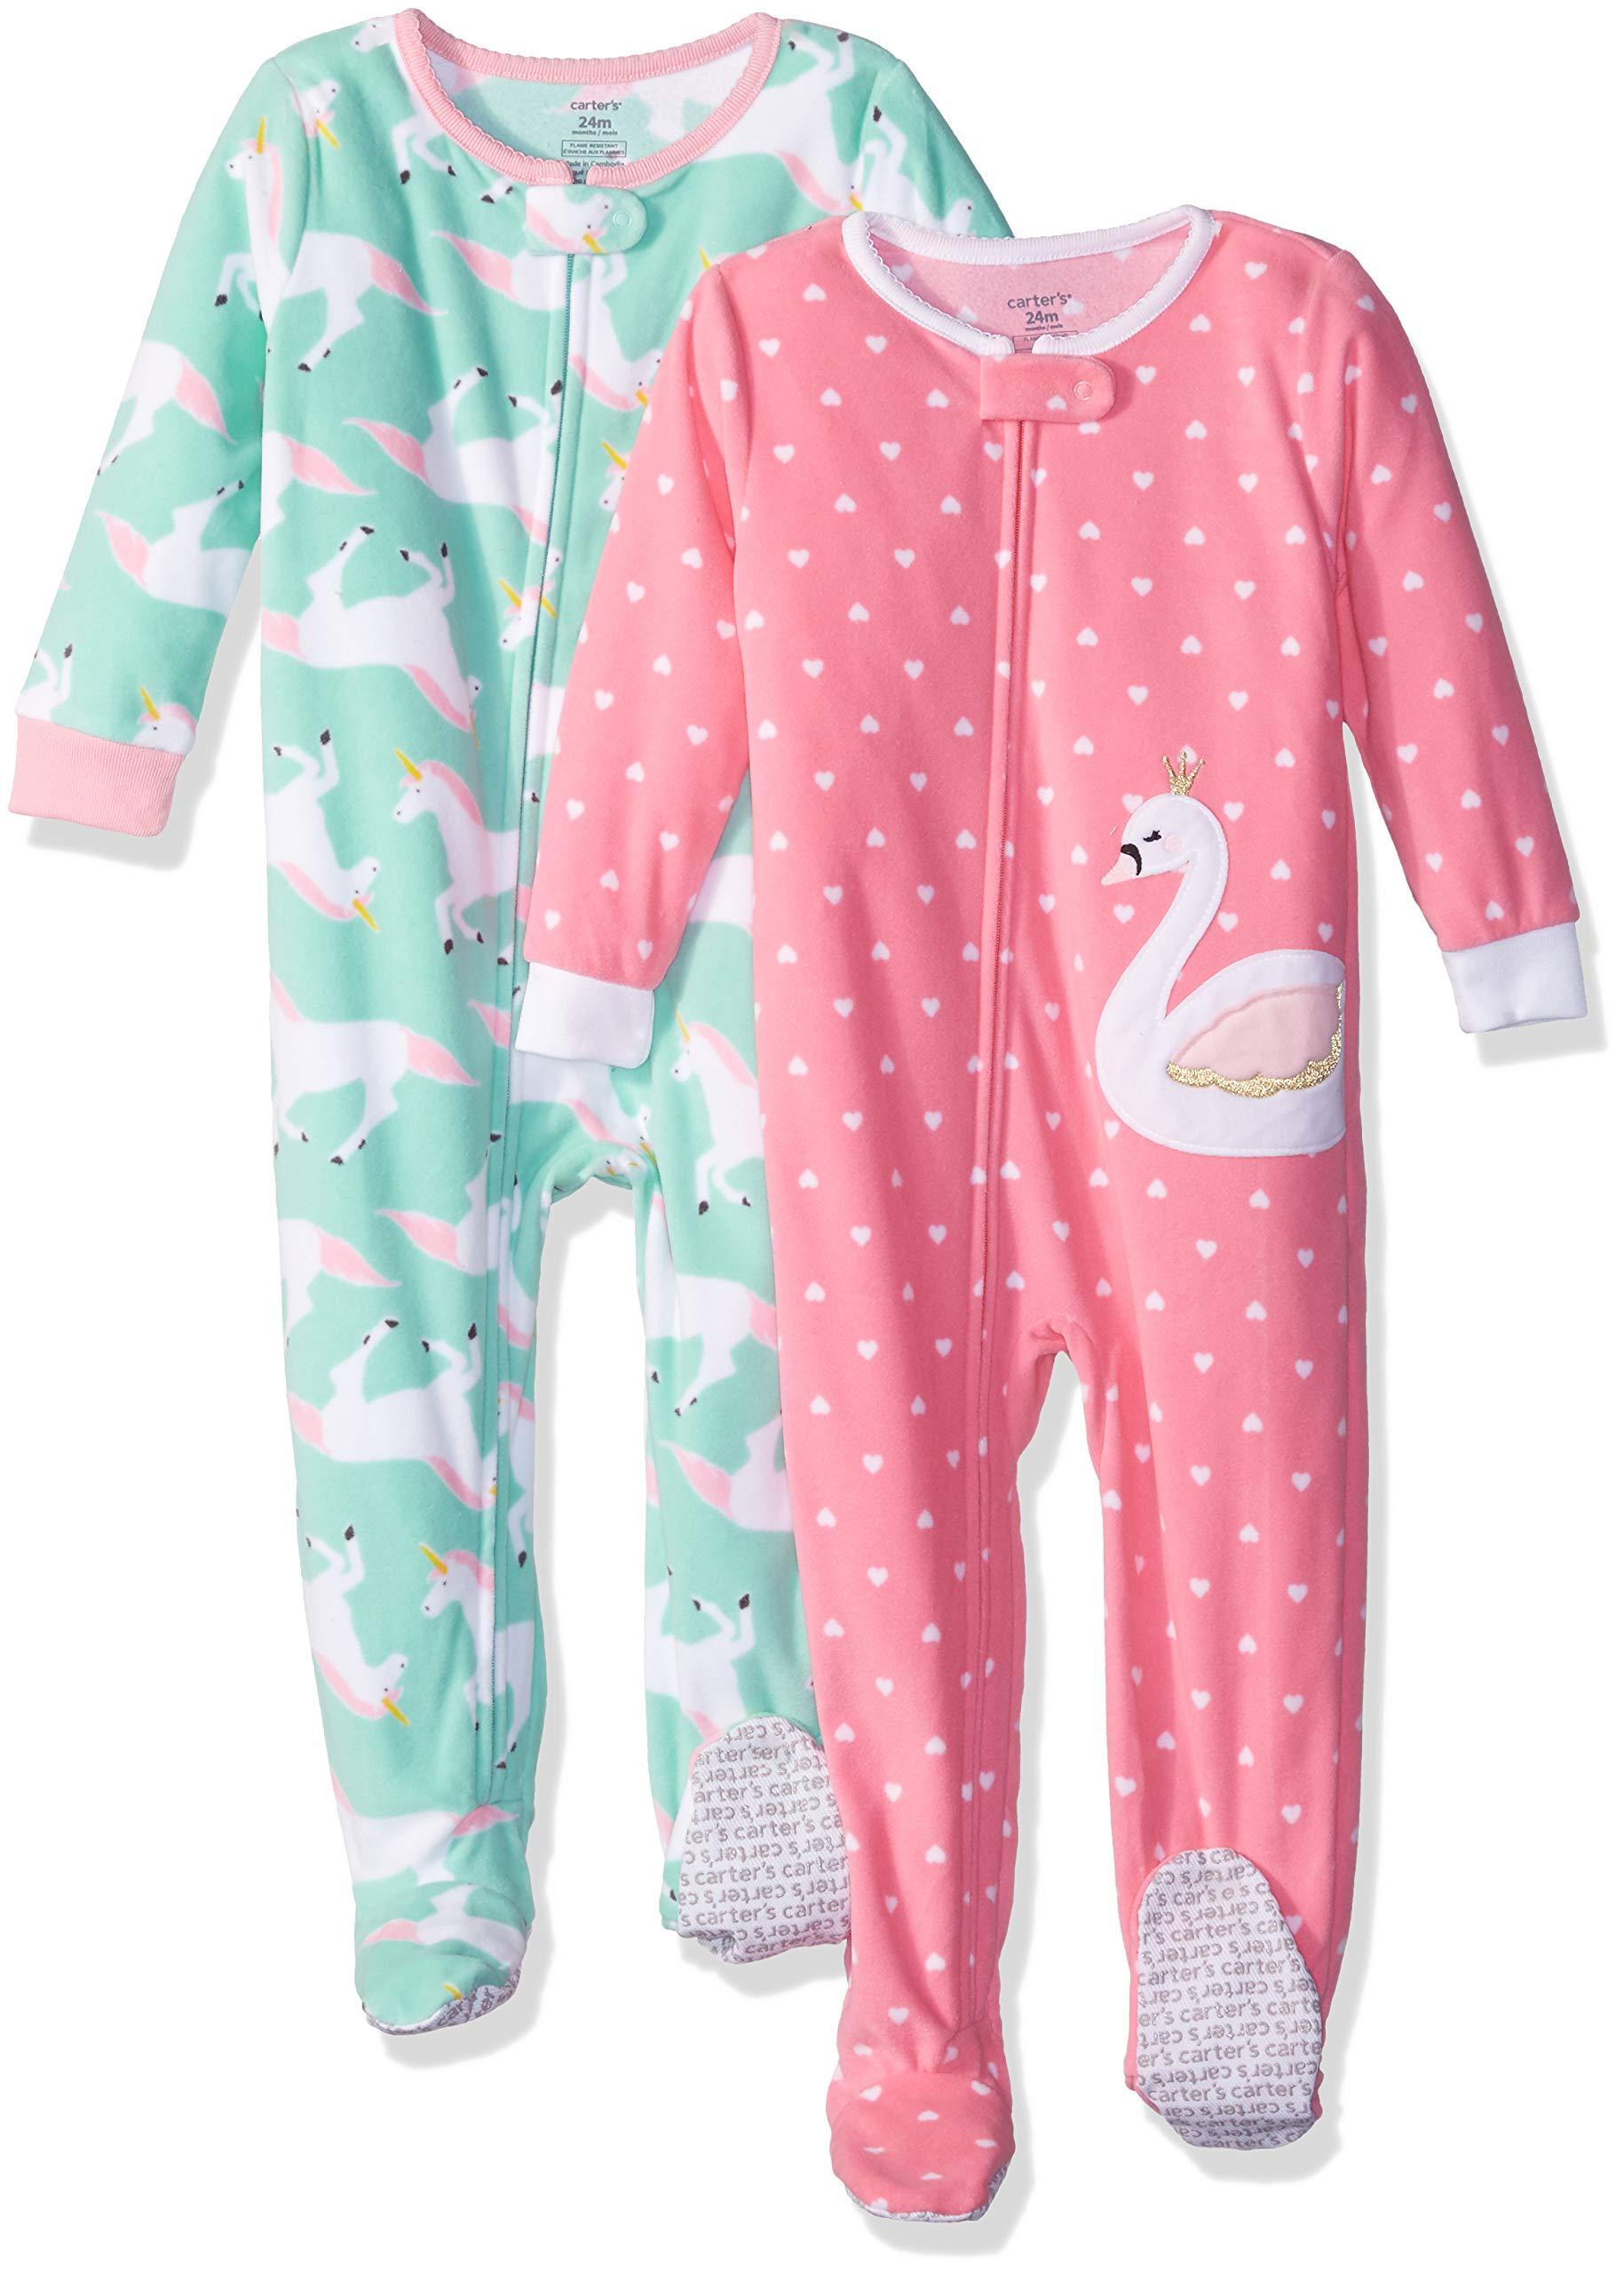 74aa1d158 Carter s Baby Girls  2-Pack Fleece Pajama Set   Blanket Sleepers ...